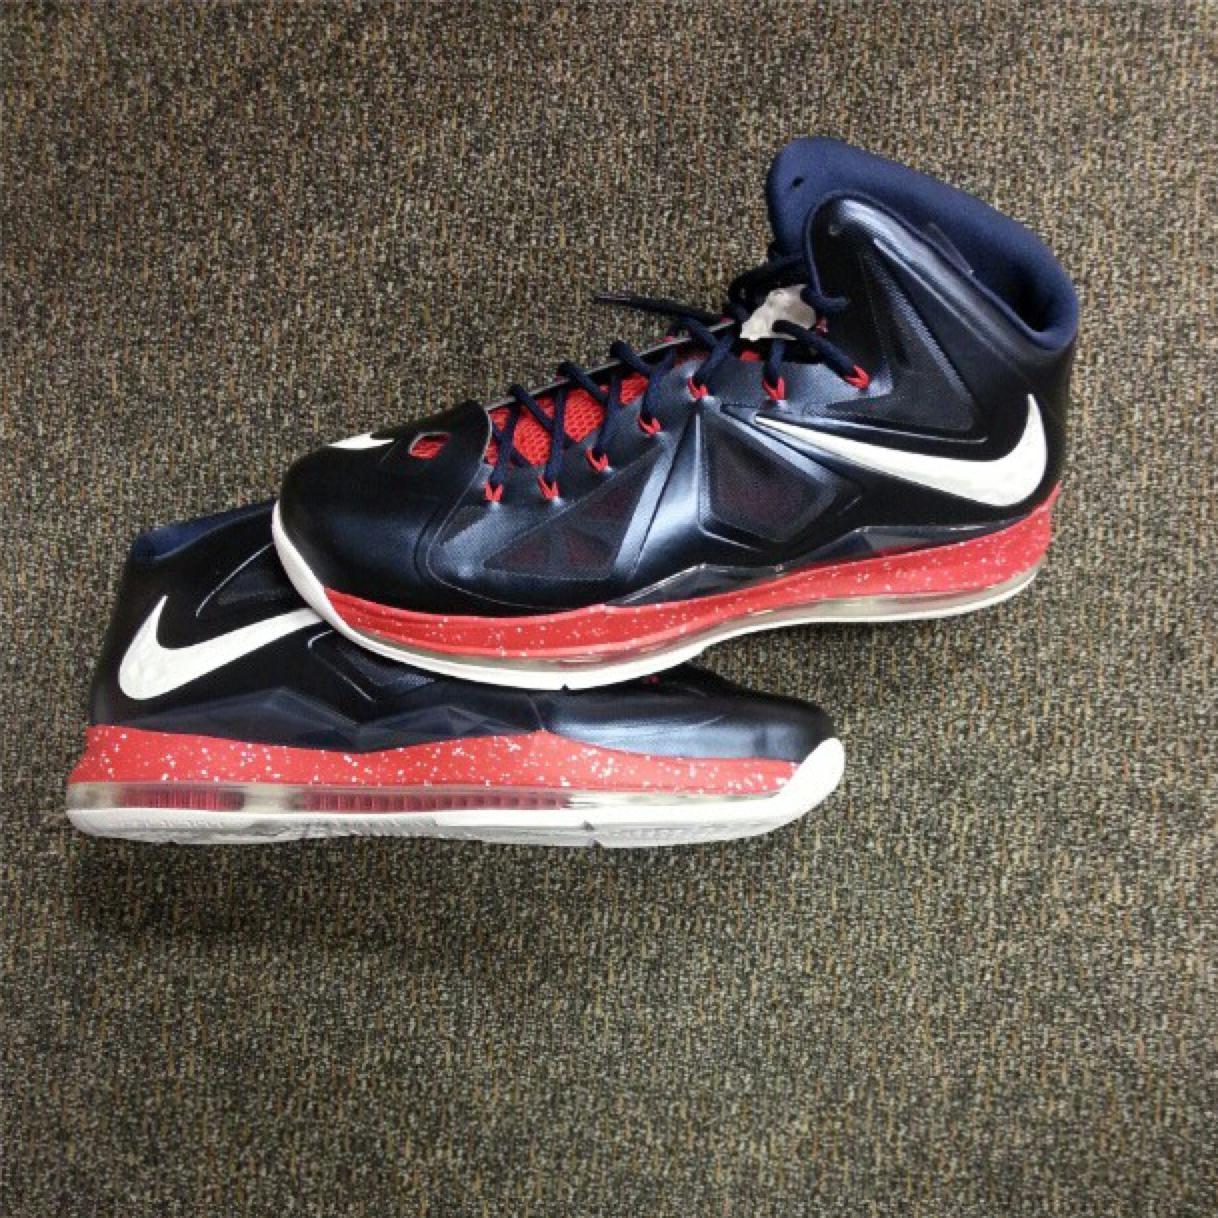 Nike LeBron X (10) 'Veterans Day' PE